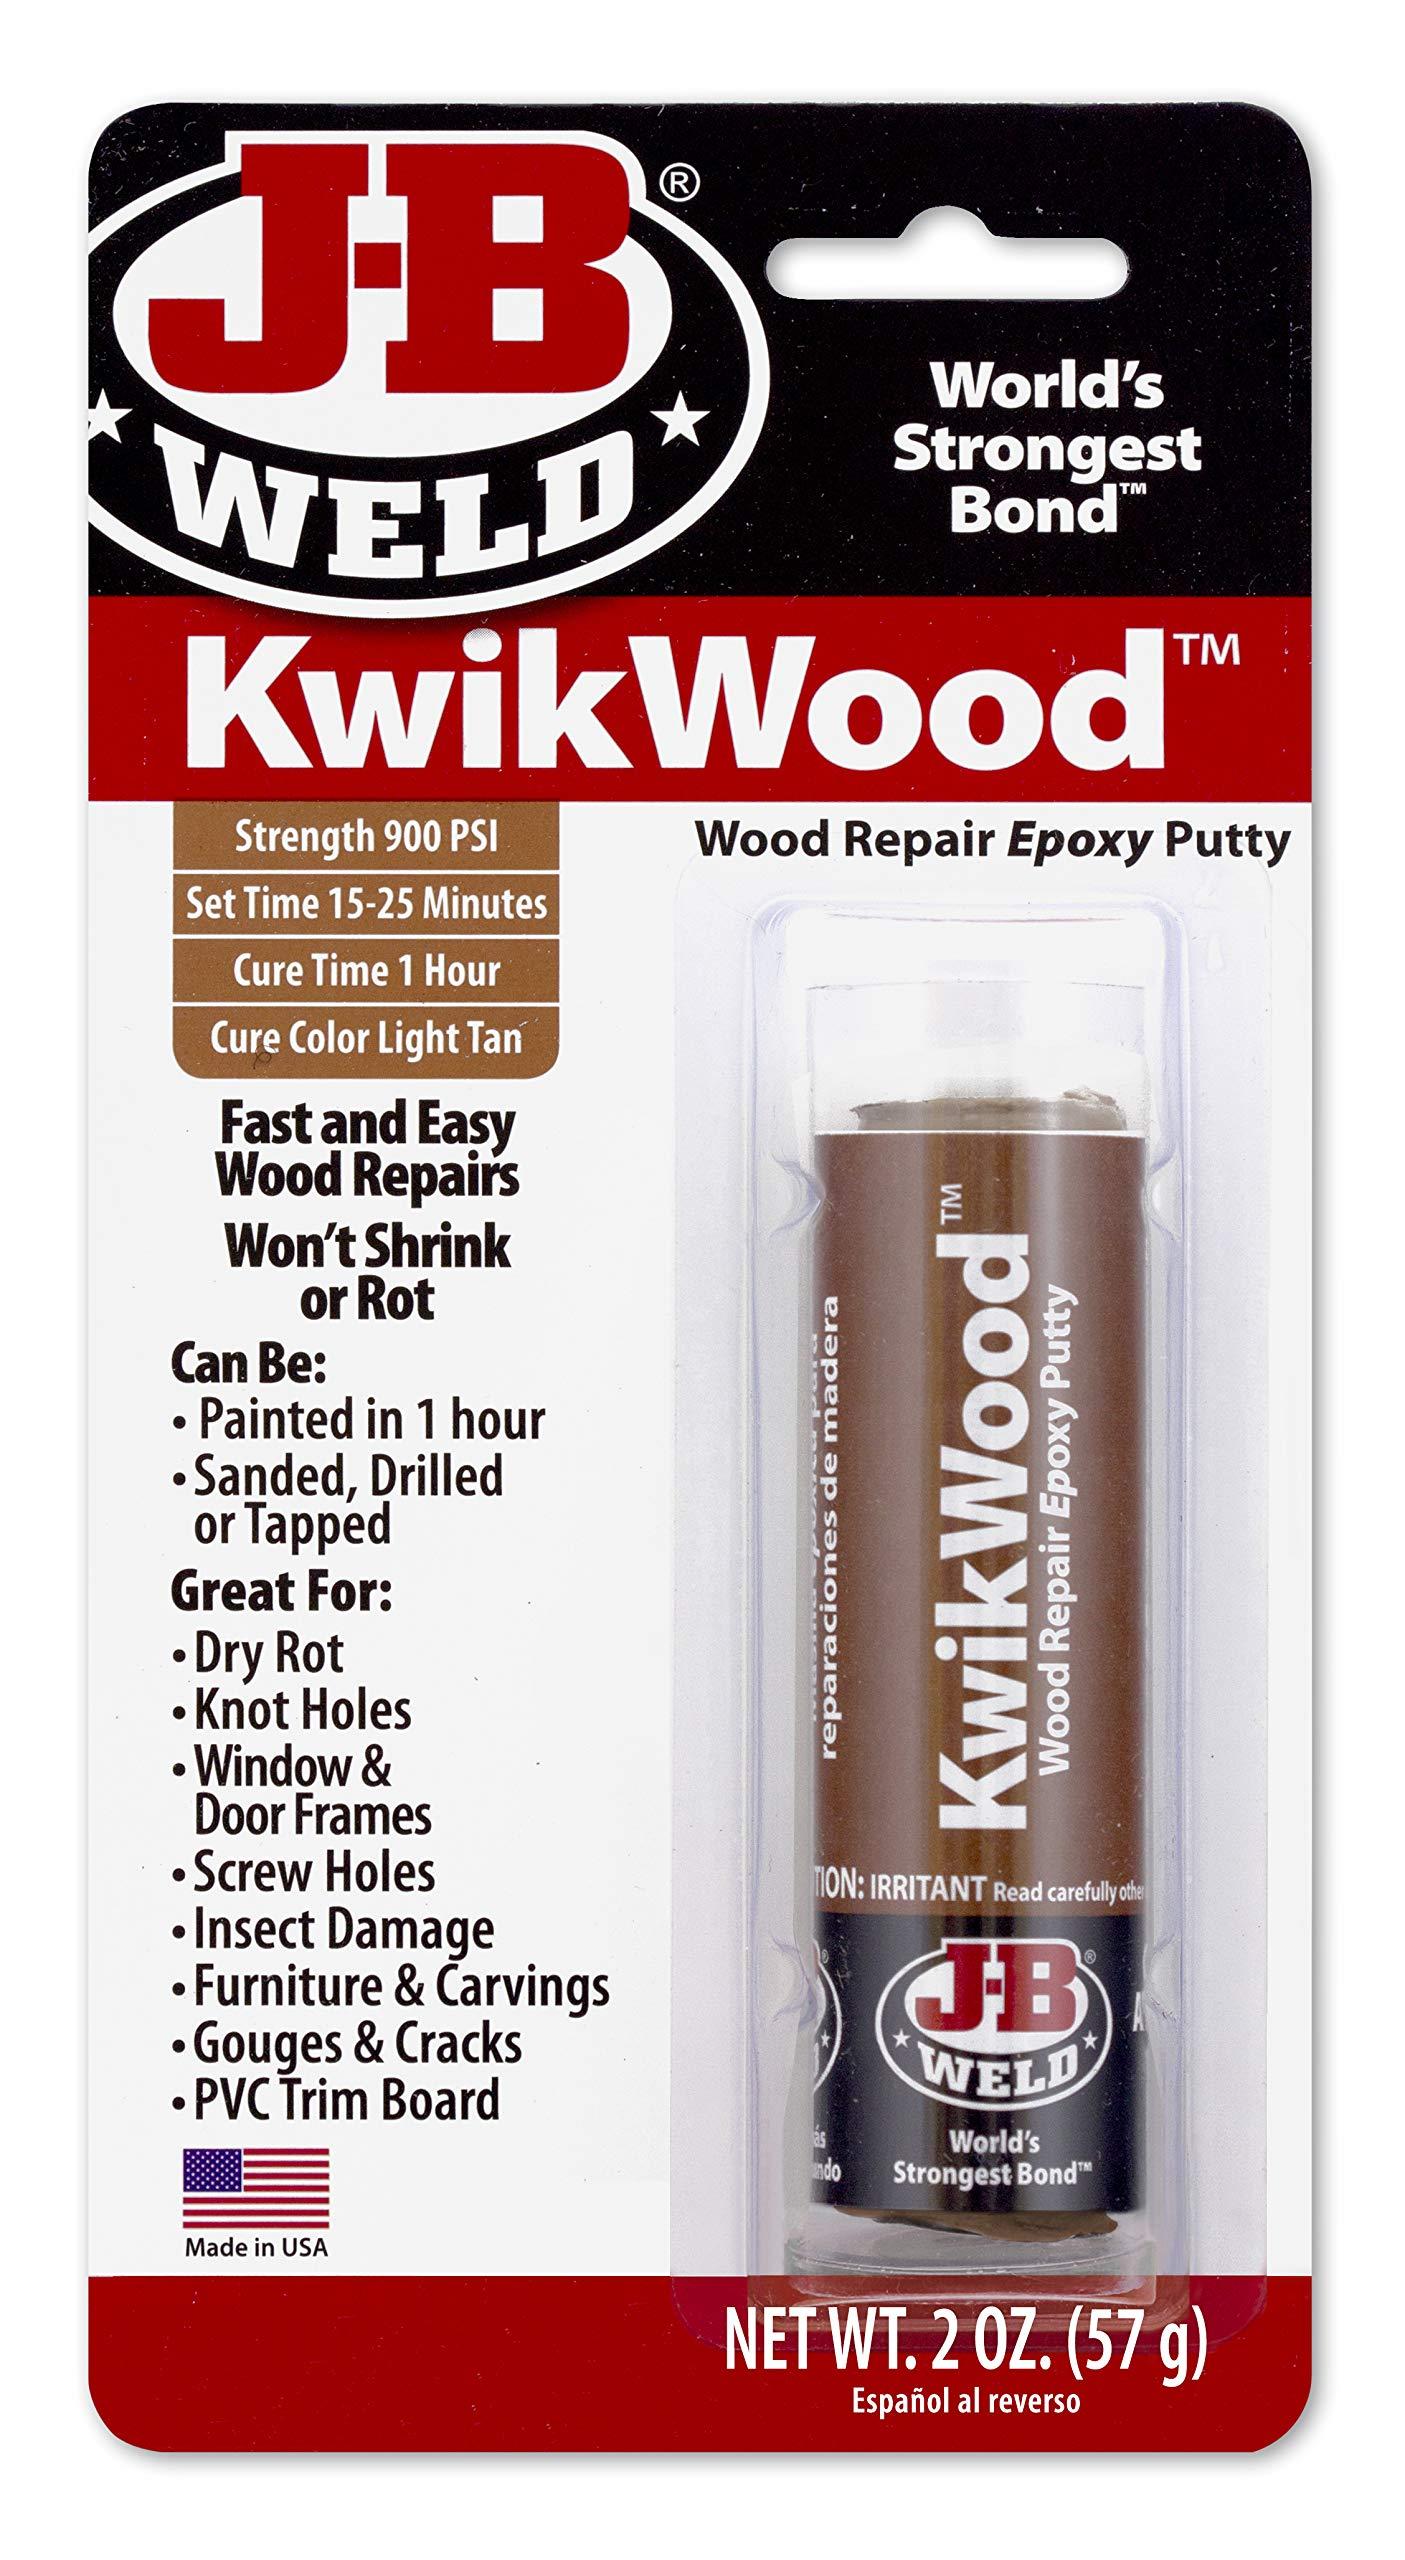 J-B Weld 8257 KwikWood Wood Repair Epoxy Putty Stick- 3.5 inch, Tan